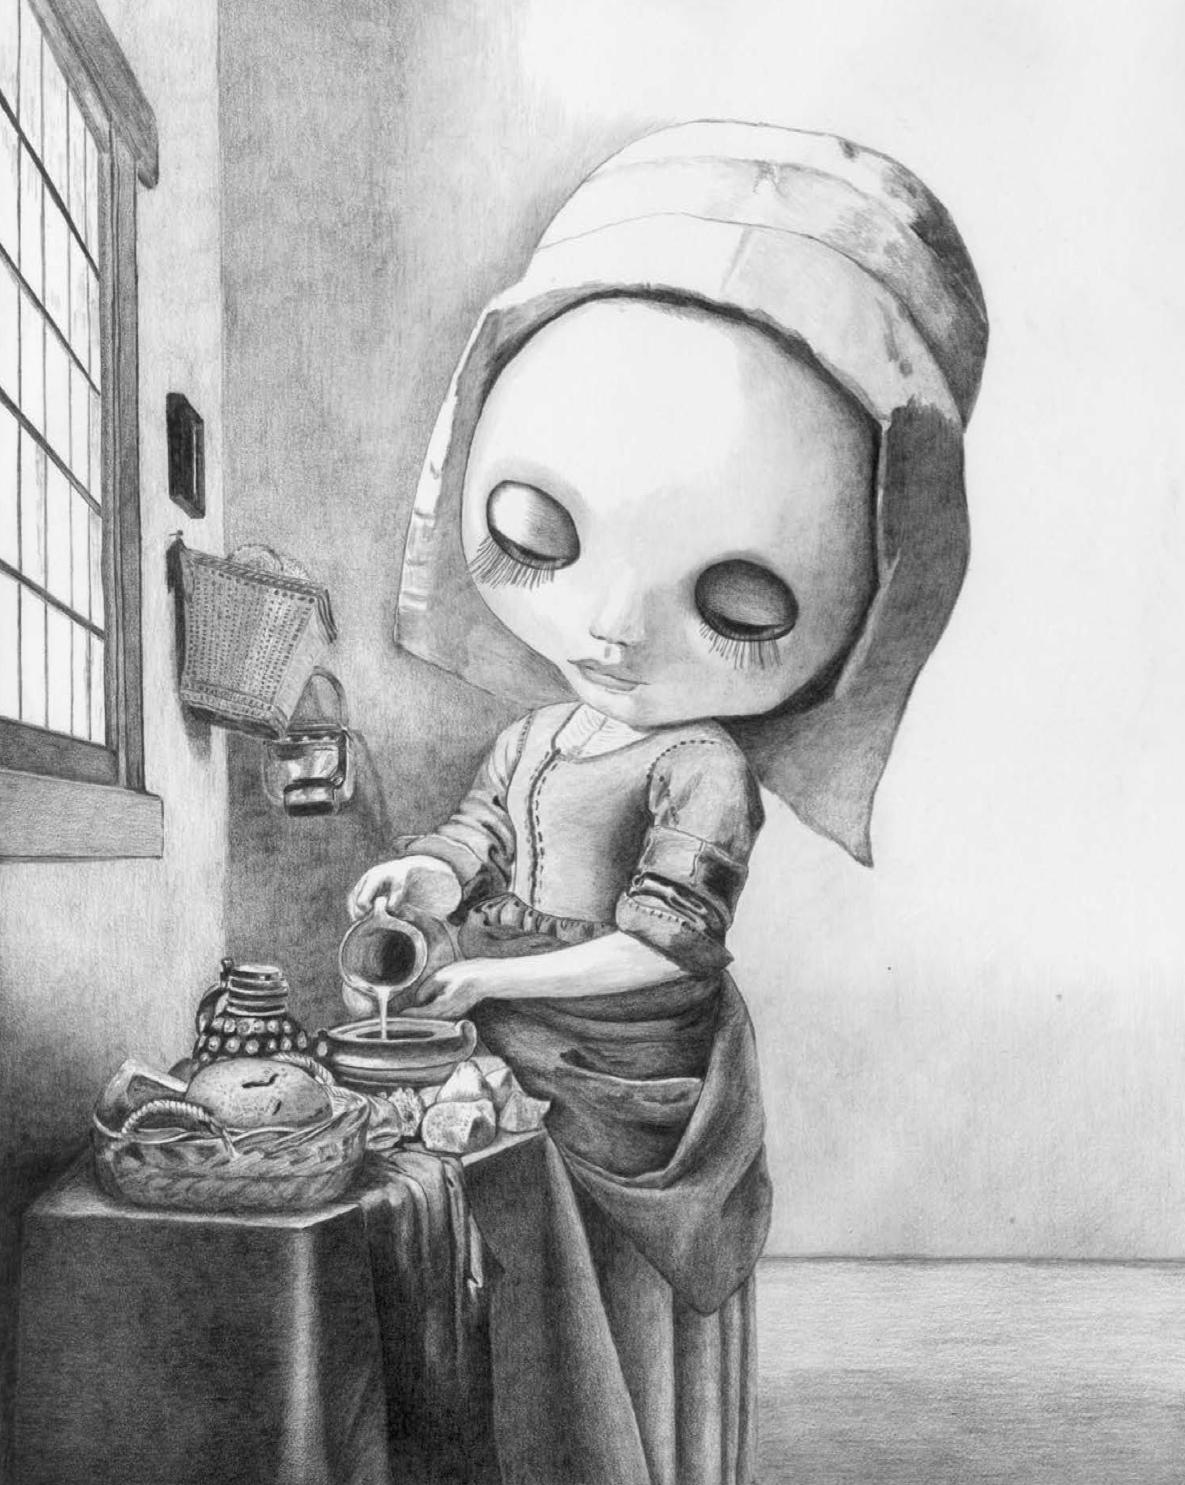 #15 - Blythe Kitchen Maid